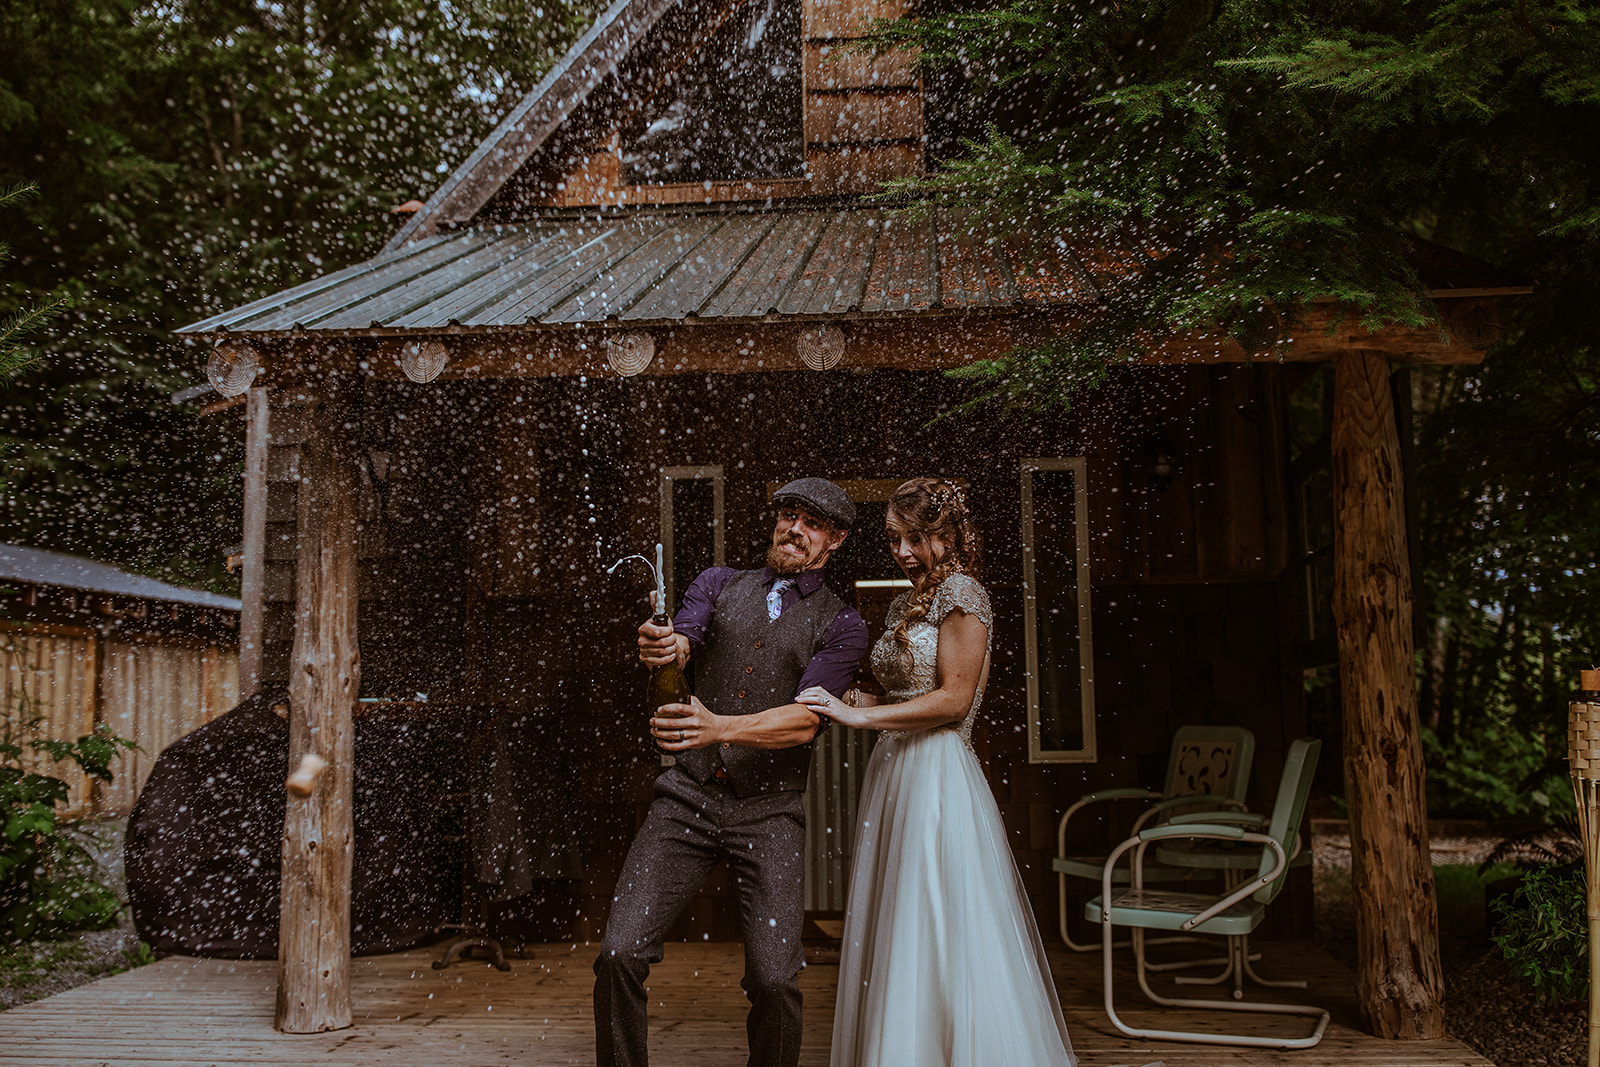 mount-rainier-cabin-elopement-megan-gallagher-photography_(316_of_568).jpg